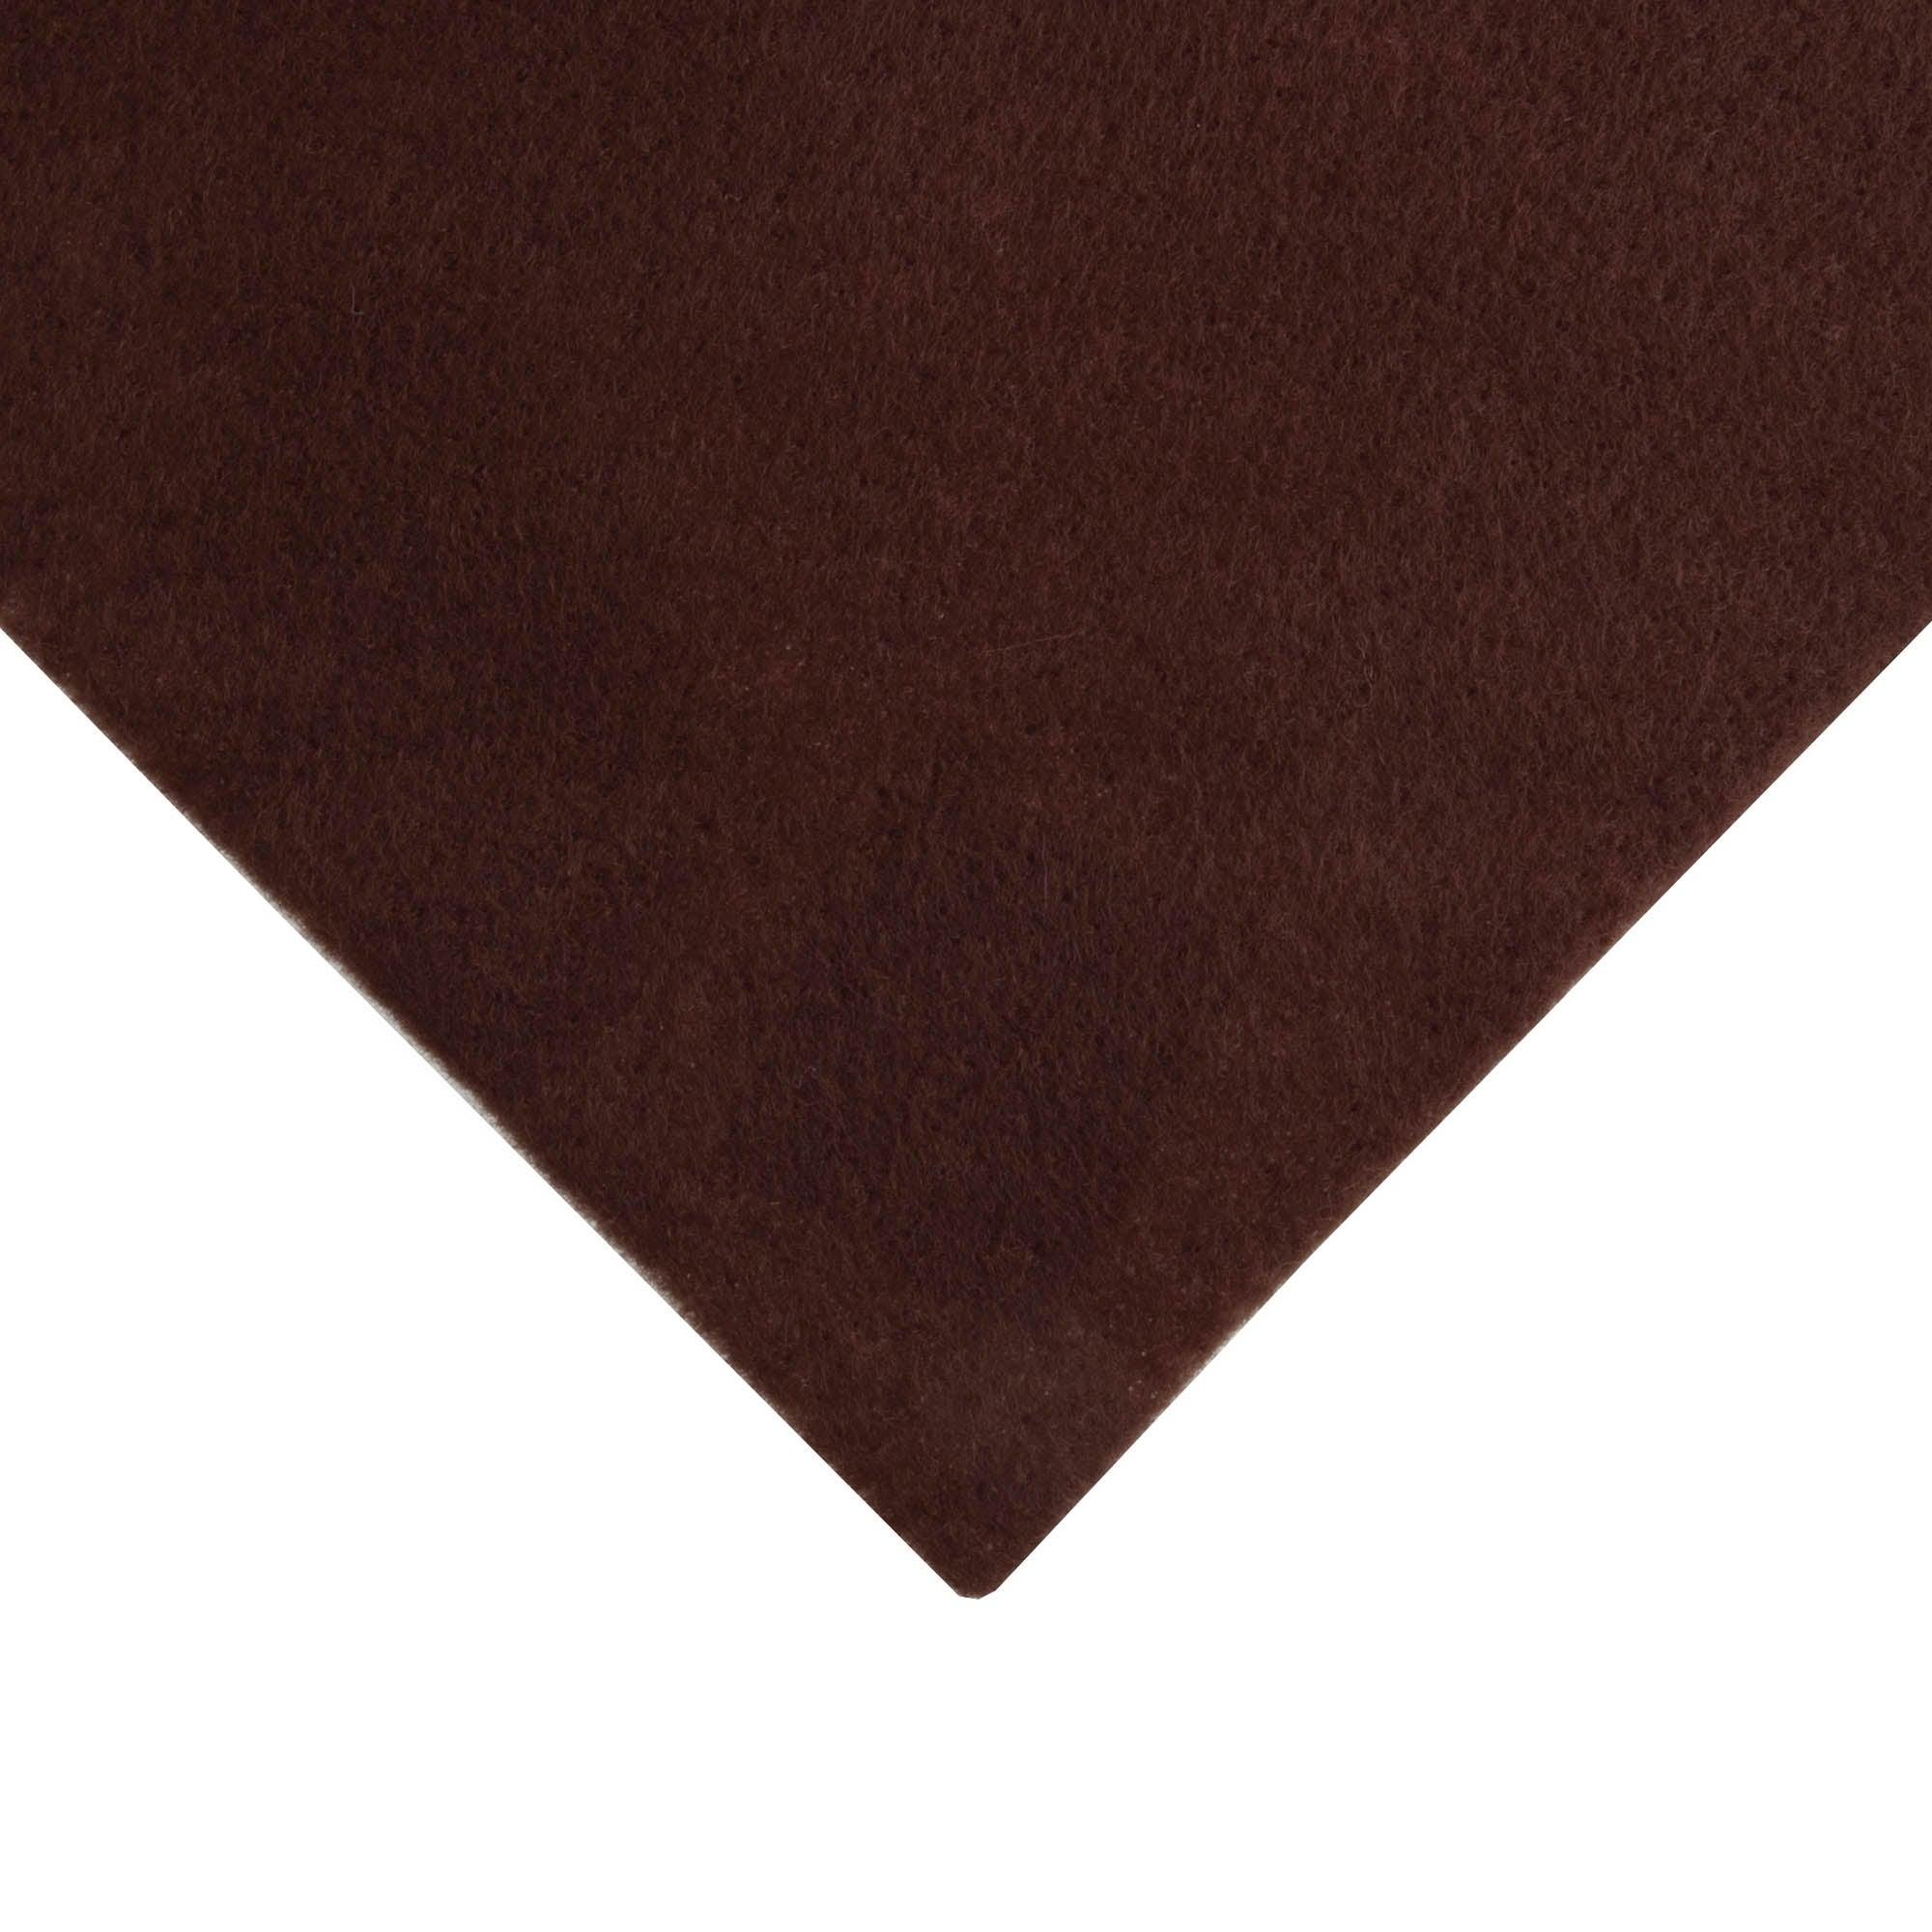 Photo of Minicraft felt roll brown